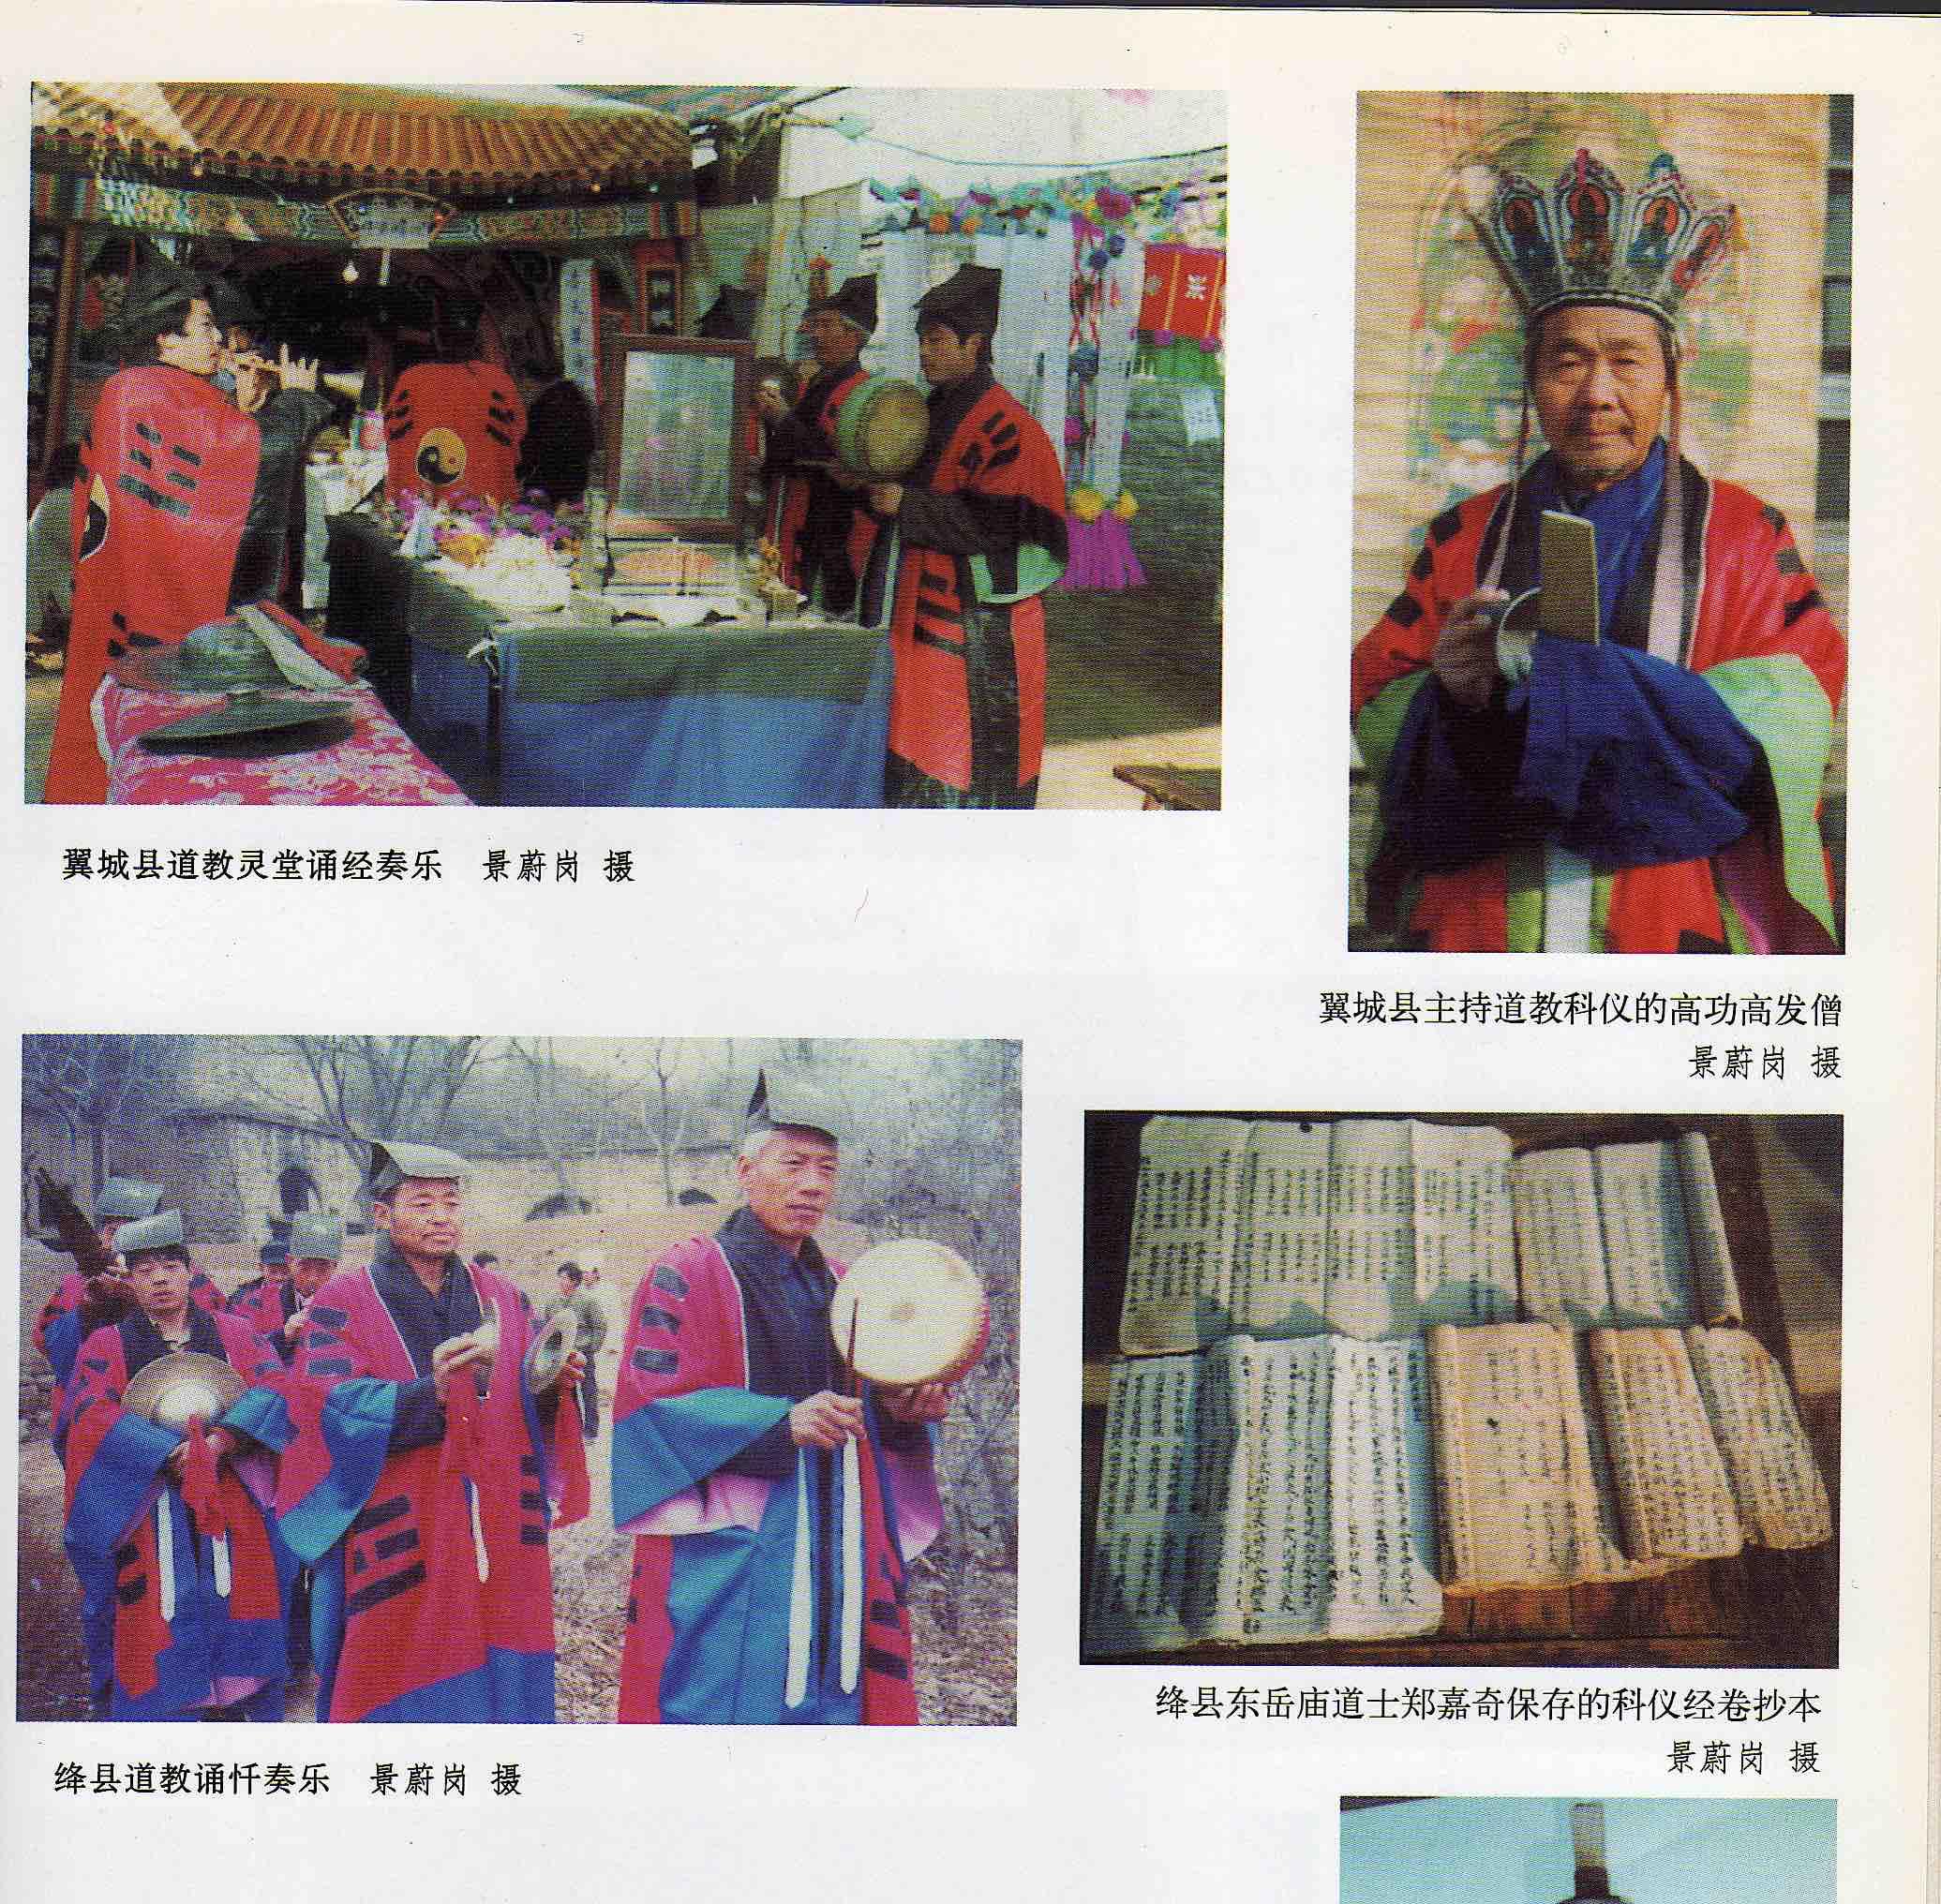 Shanxi pics